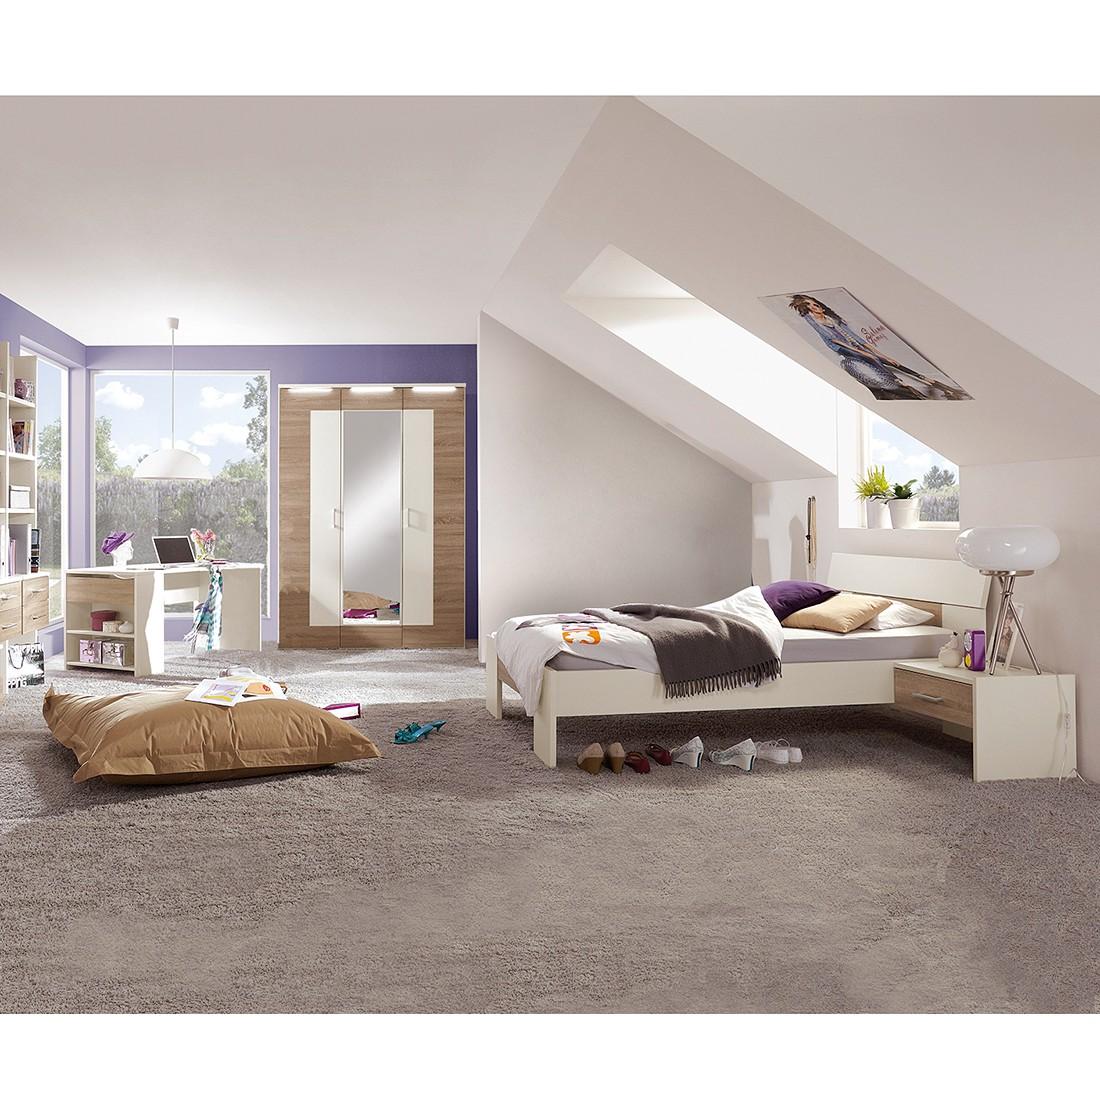 EEK A+, Jugendzimmerkombination Vegas Plus (5-teilig) - 140 x 200cm - Mit Beleuchtung, röhr